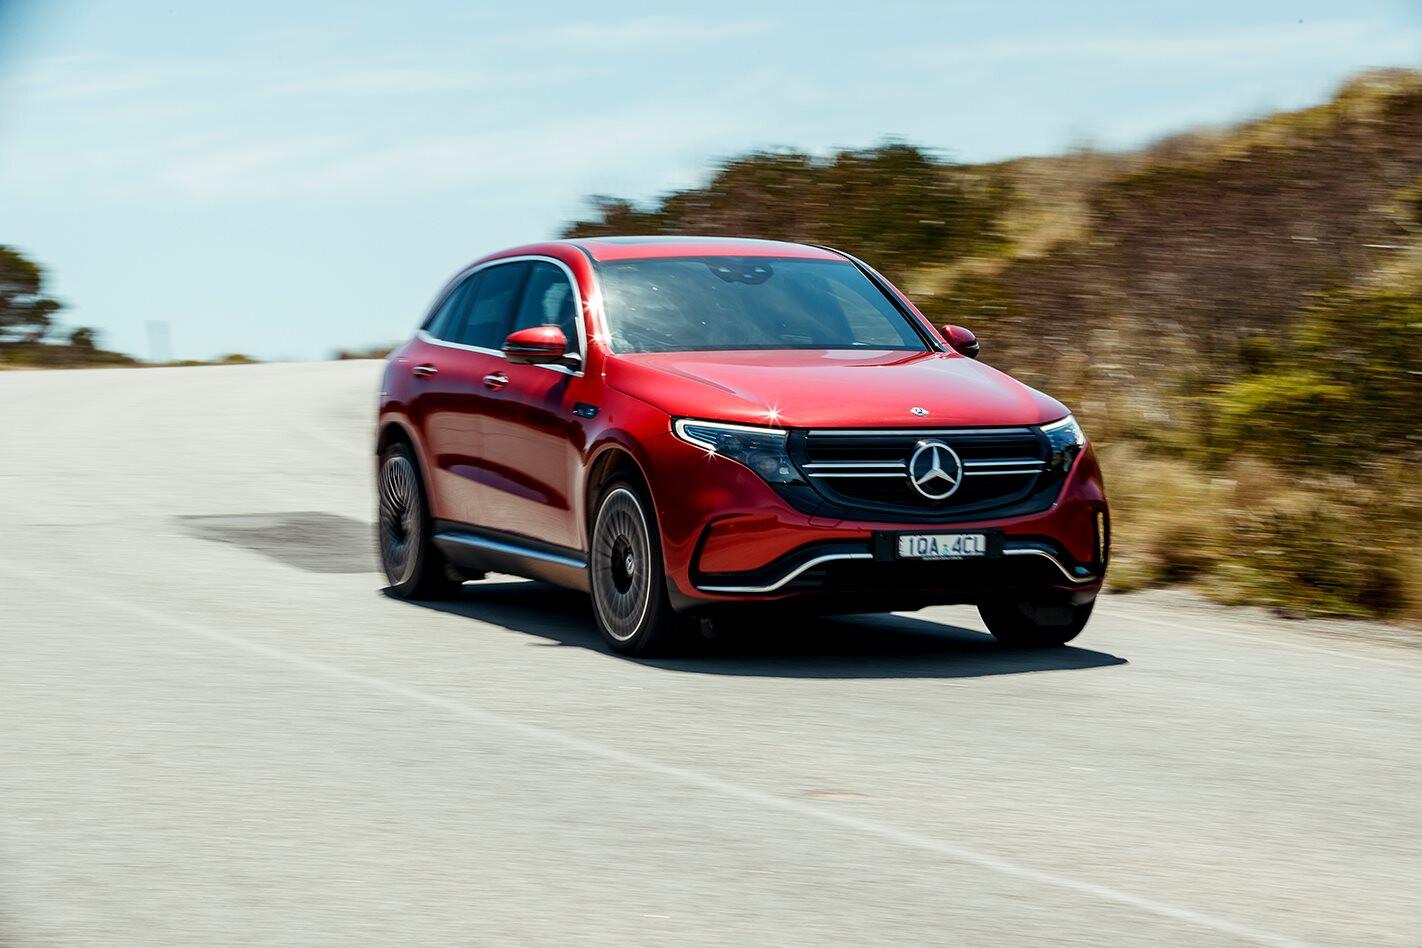 Mercedes-Benz EQC Winner Wheels Car of the Year 2020